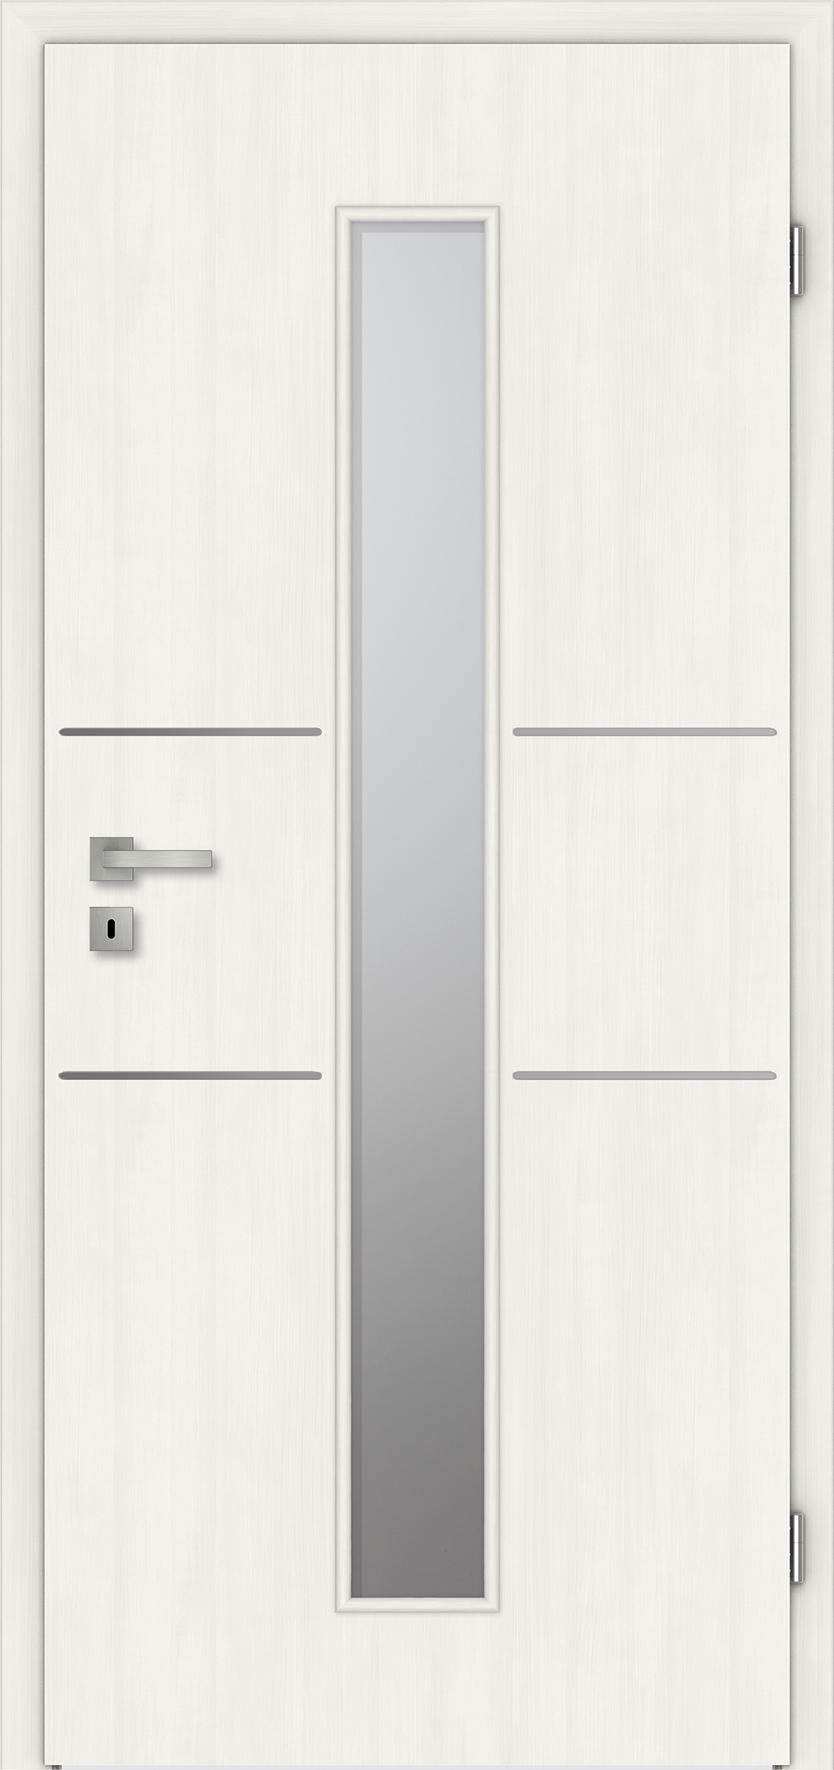 RY-533-LA2-DA_CPL Touch Whiteline